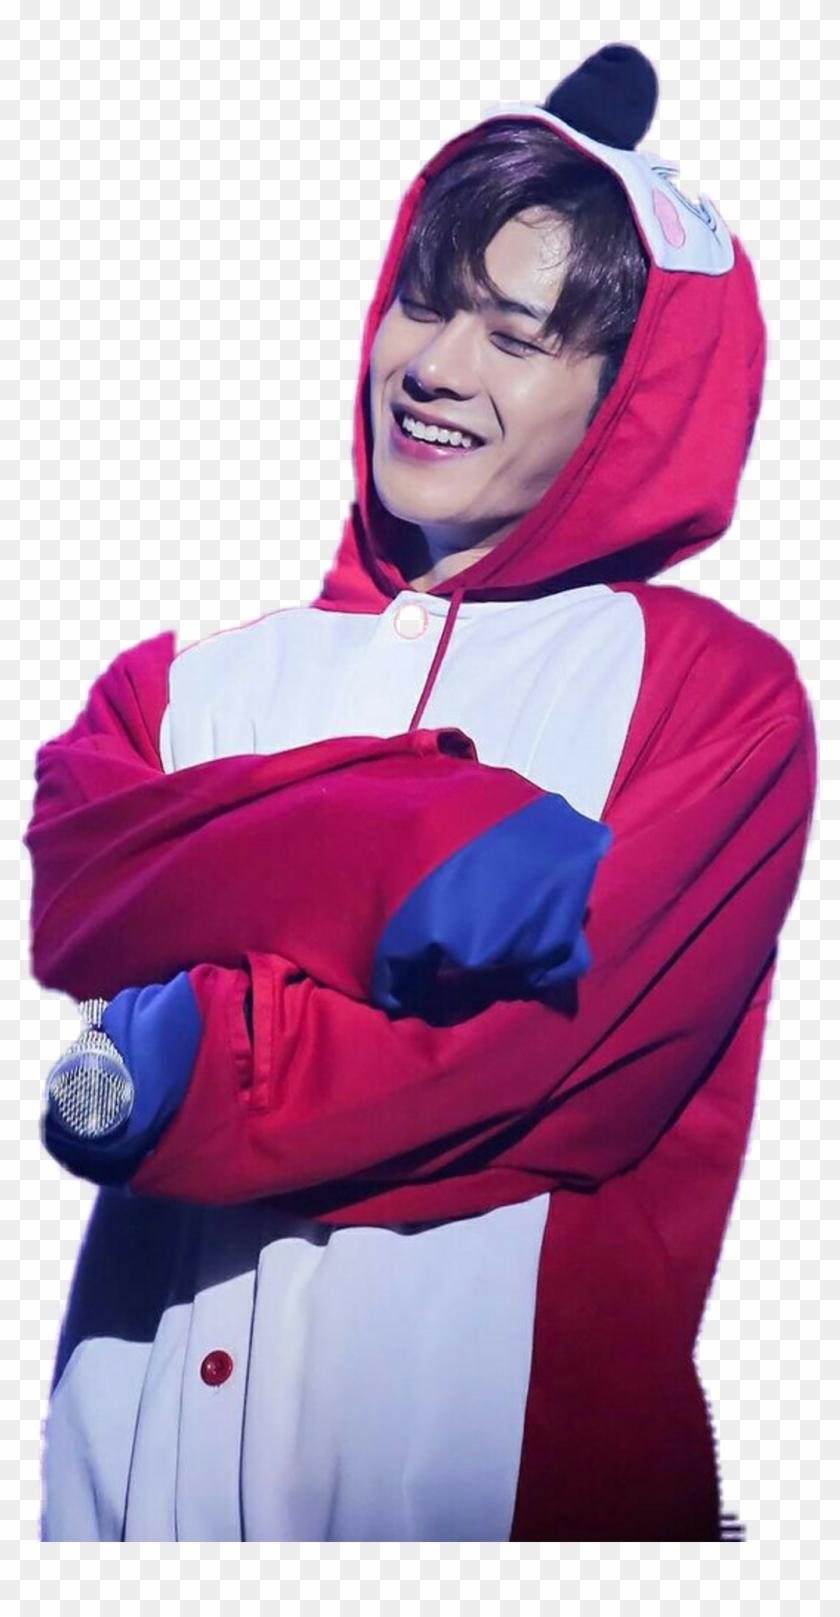 Kpop Got7 Png Do Jackson őㅋㅁ Got7 Jackson Soft Edit Transparent Png 1024x1923 2204491 Pngfind